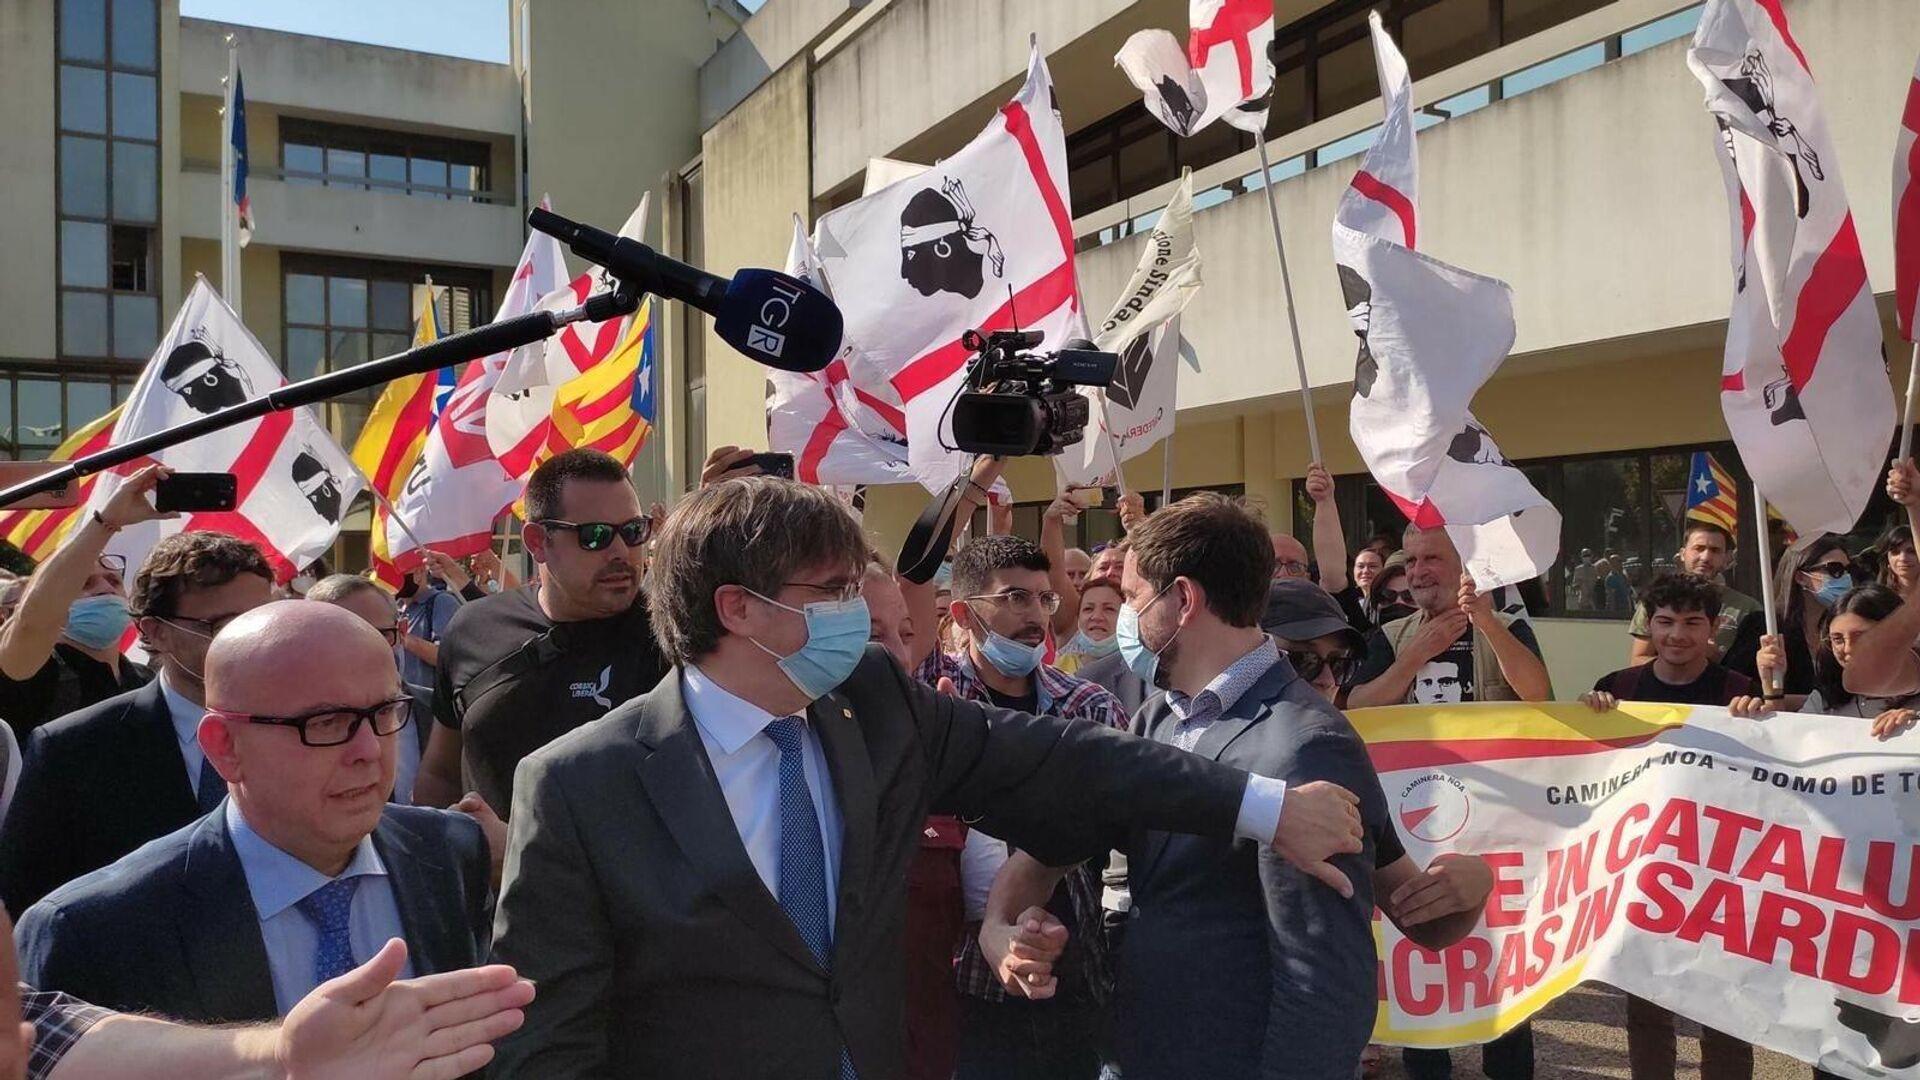 El expresidente de la Generalitat Carles Puigdemont llega al Tribunal de Apelación de Sassari (Italia) - Sputnik Mundo, 1920, 04.10.2021